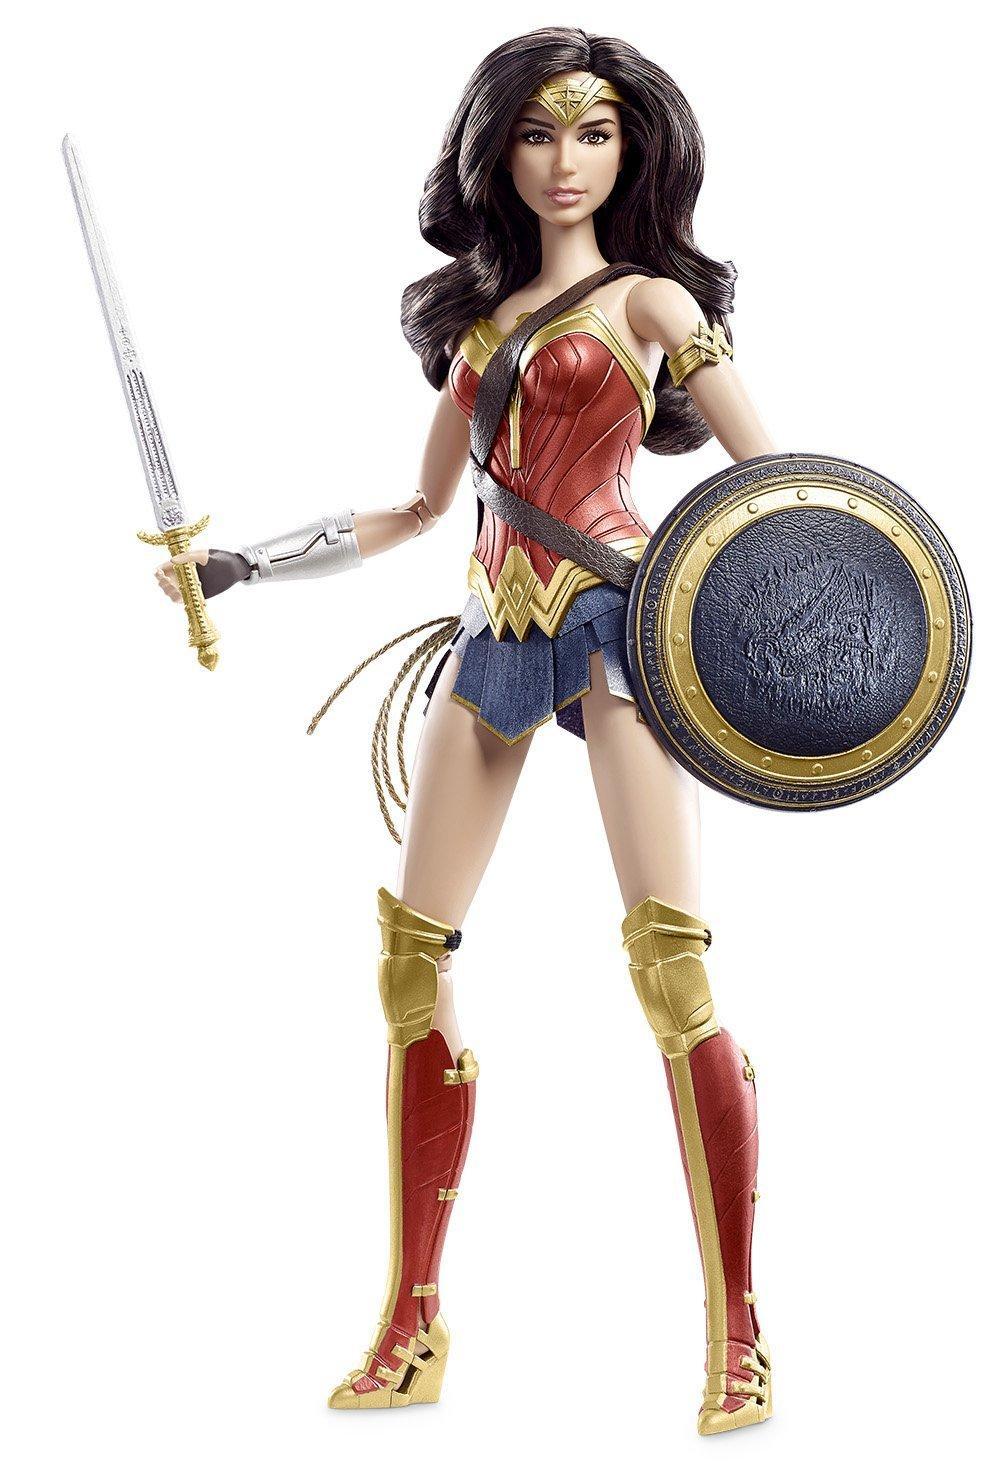 Amazoncom Barbie Collector Batman V Superman Aube De-6821